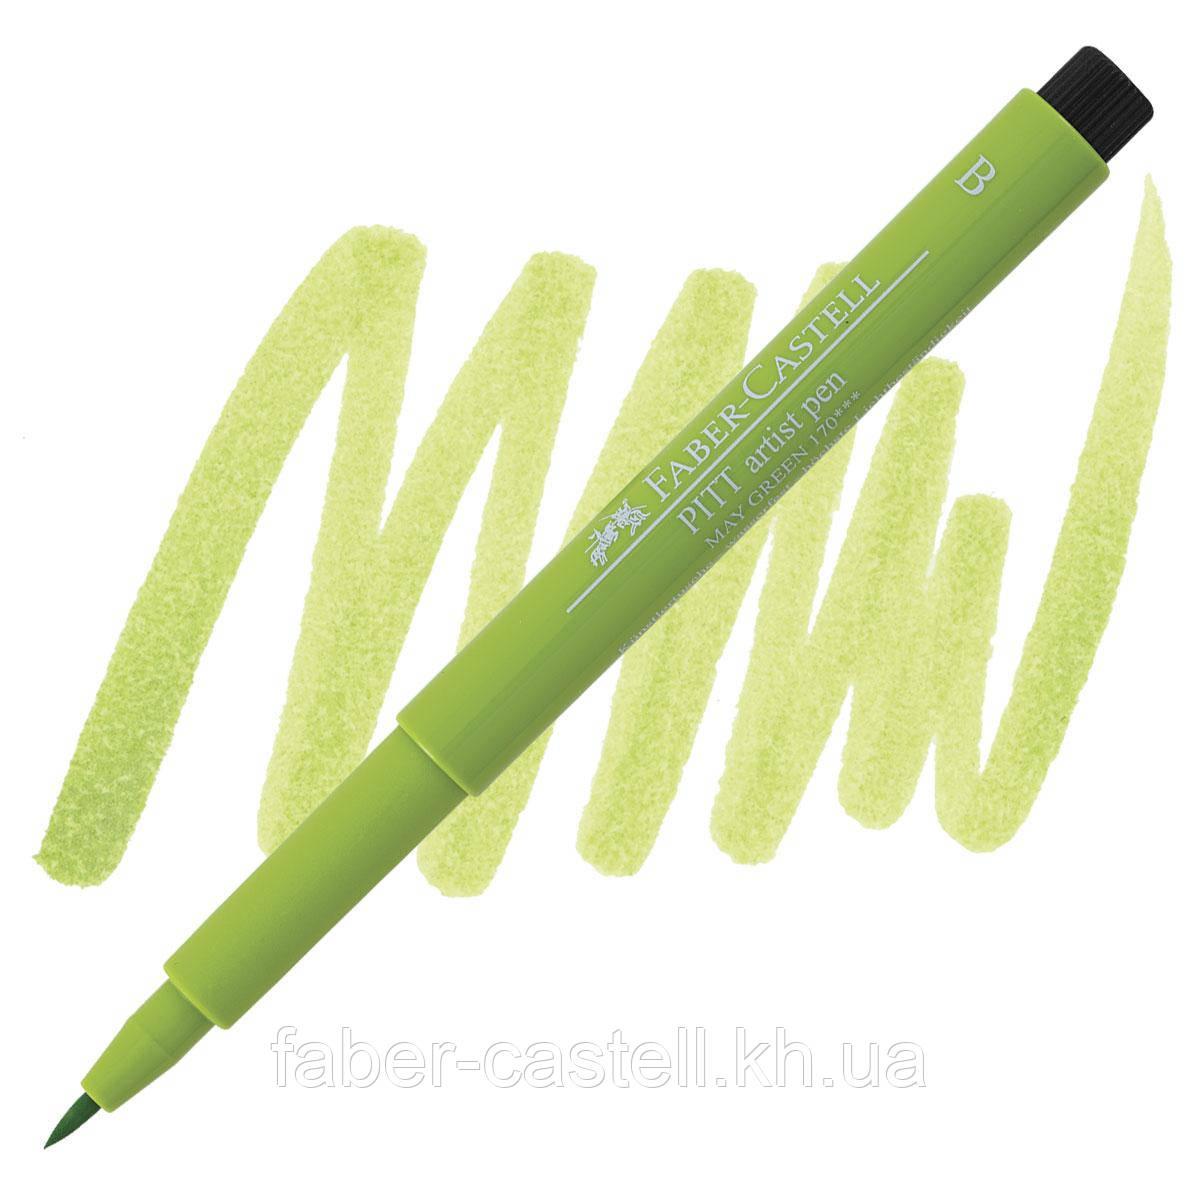 "Ручка-кисточка капиллярная Faber - Castell PITT® ARTIST PEN ""BRUSH"" №170 майская зелень, 167470"